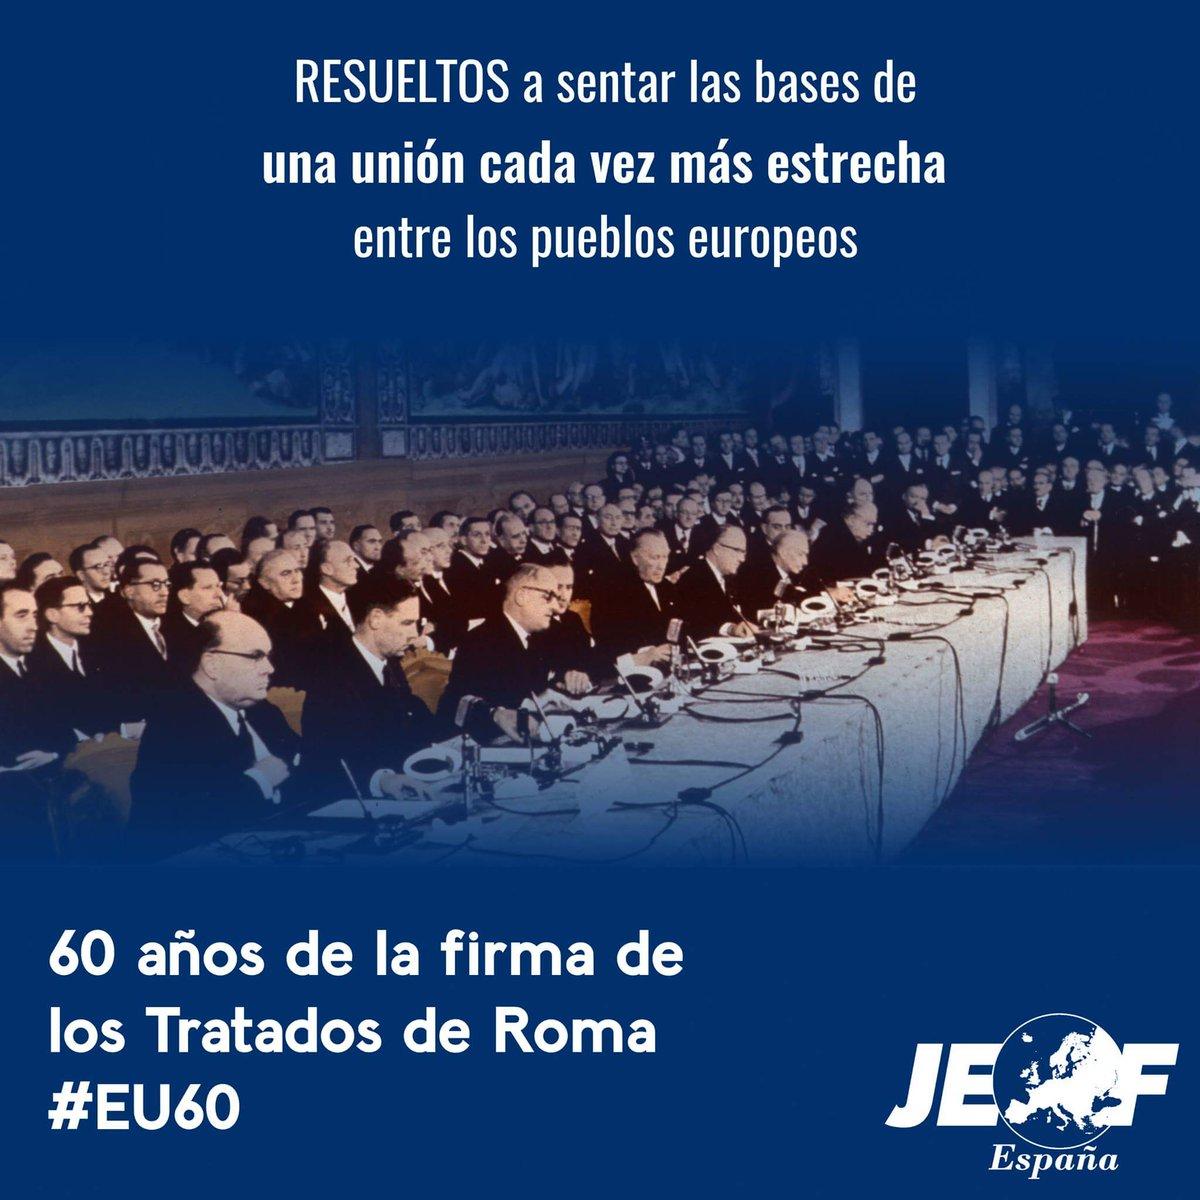 #EU60